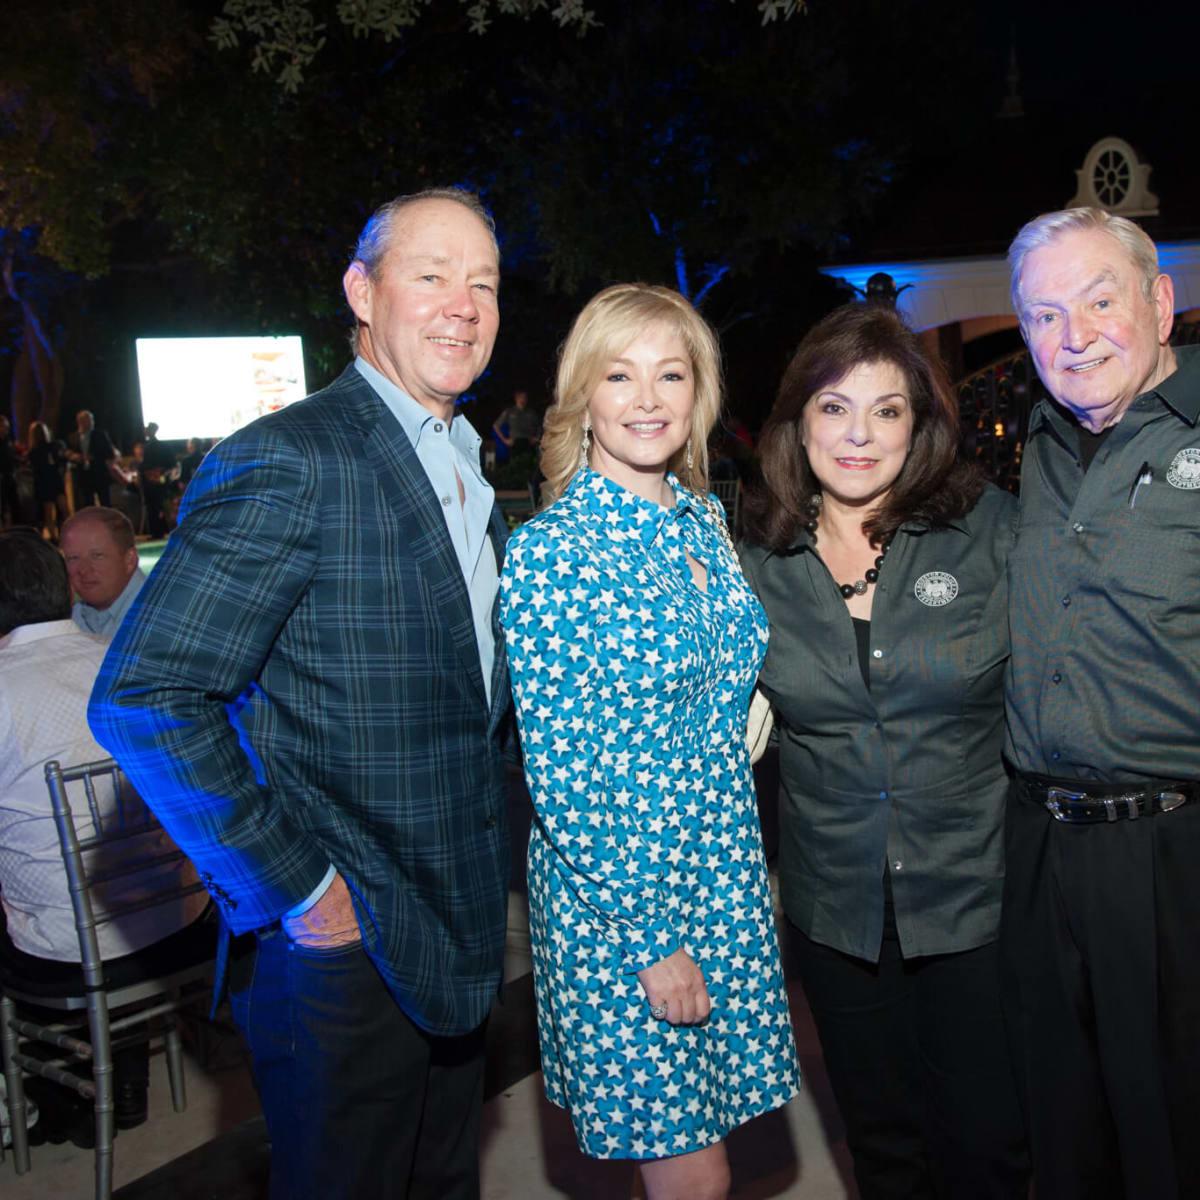 Houston, HPD True Blue Gala, Oct. 2016, Jim Crane, Whitney Wheeler, Laura Ward, Dave Ward